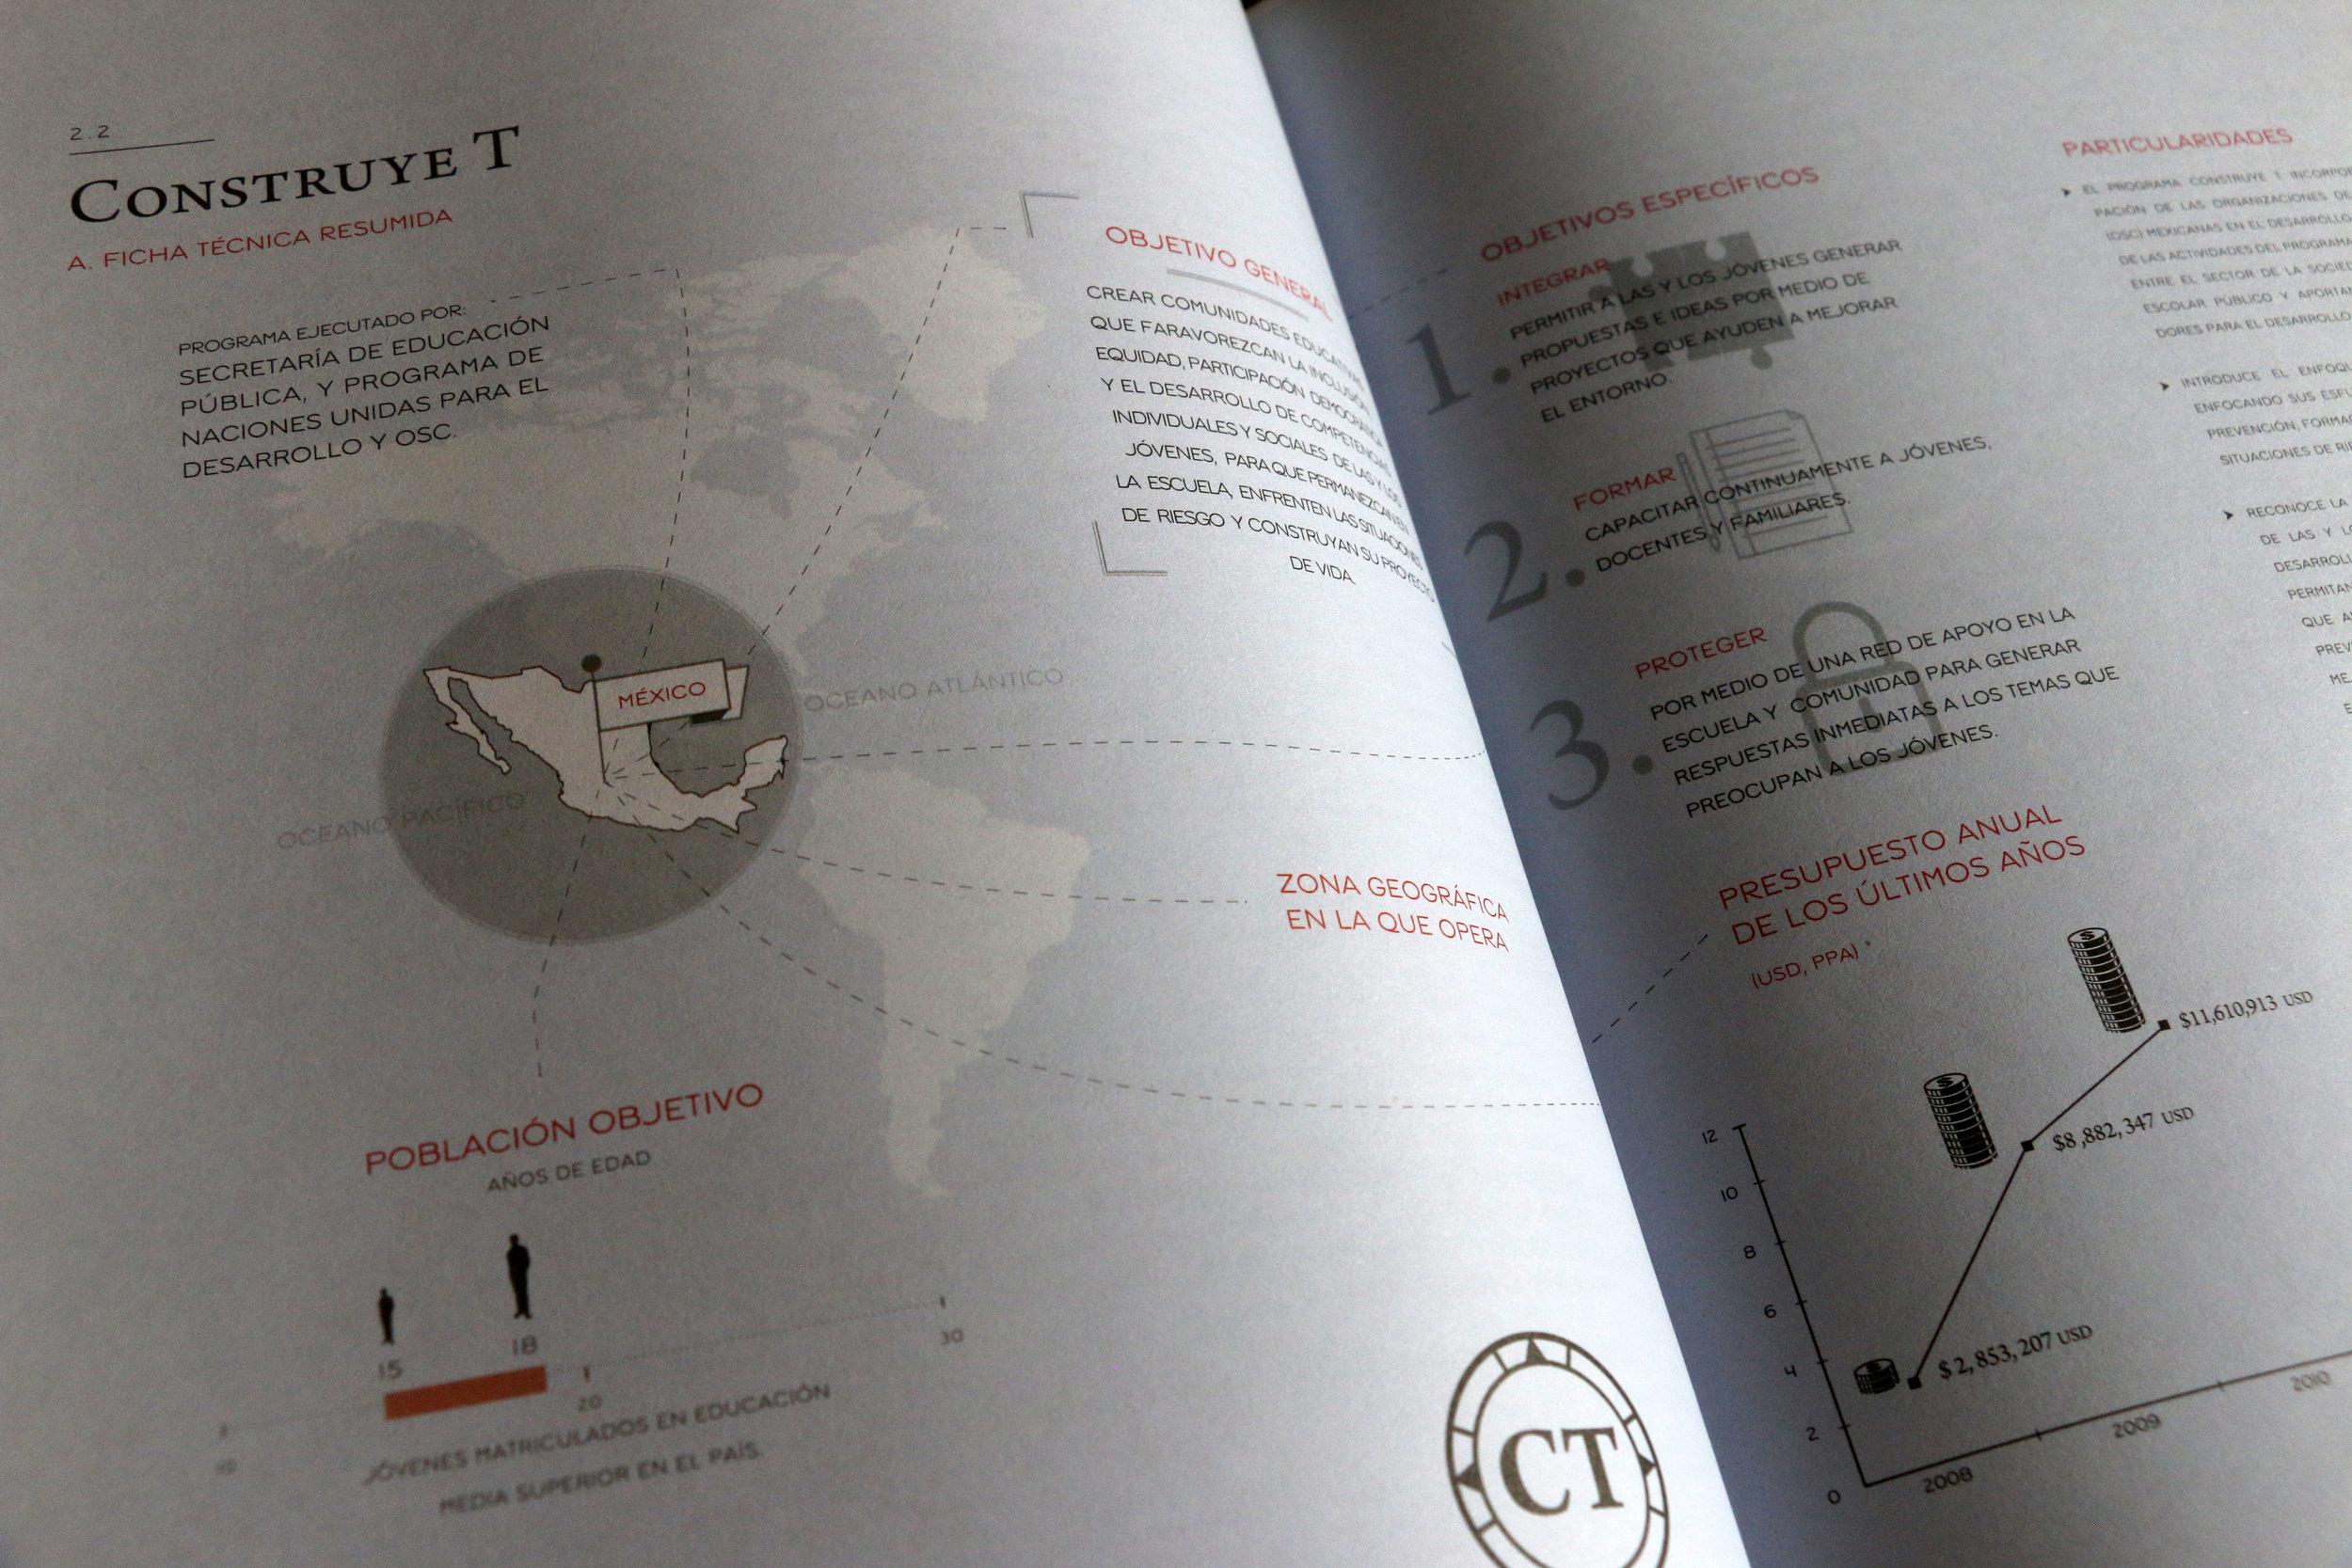 Fundación IDEA detail